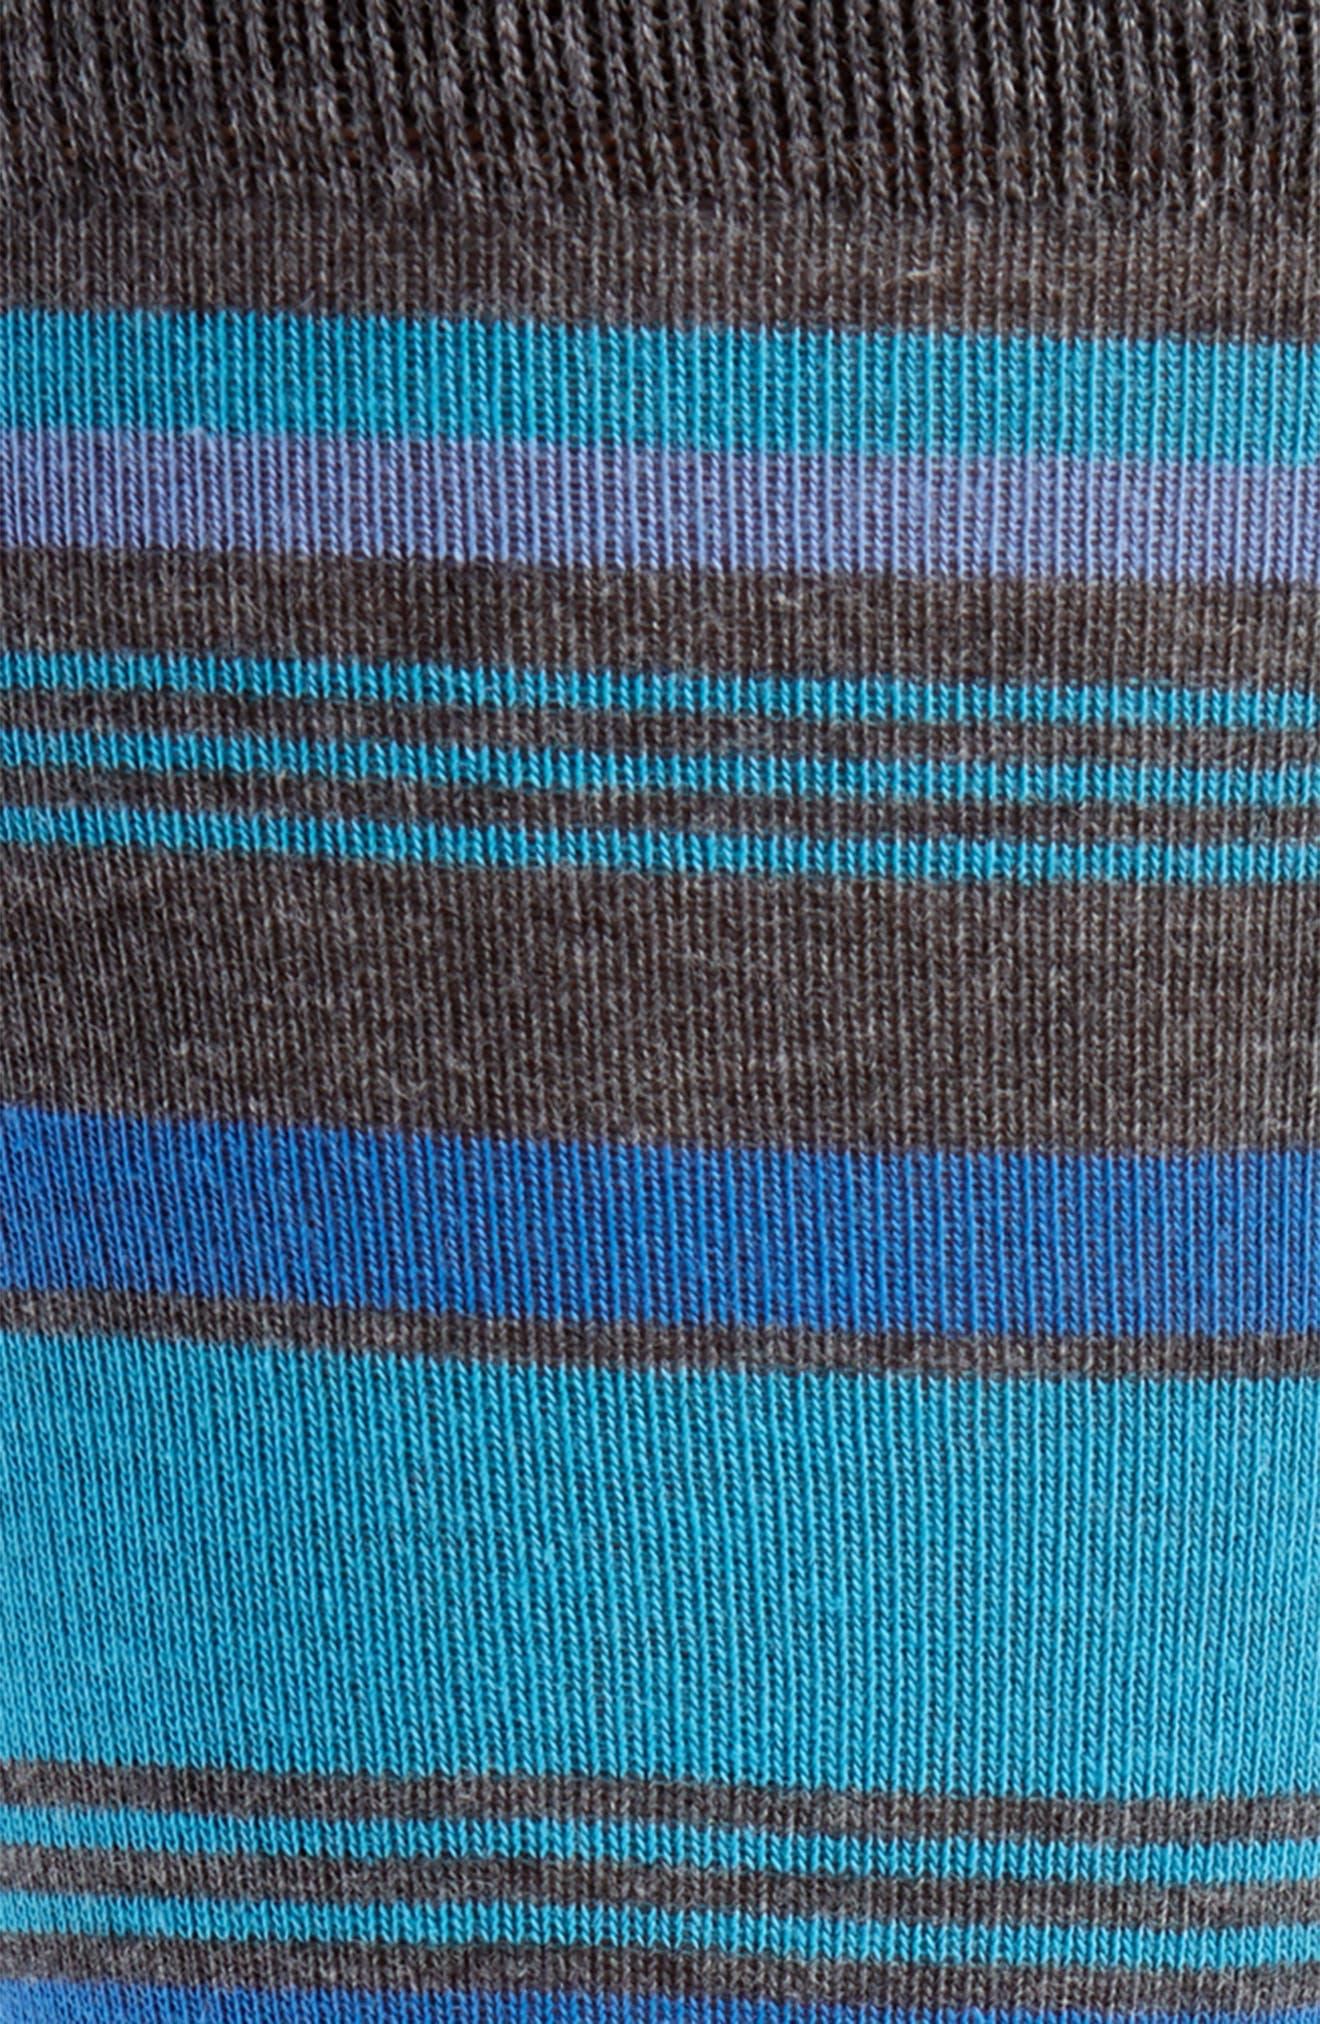 Mixed Uneven Stripe Socks,                             Alternate thumbnail 2, color,                             BLUE/ CHARCOAL